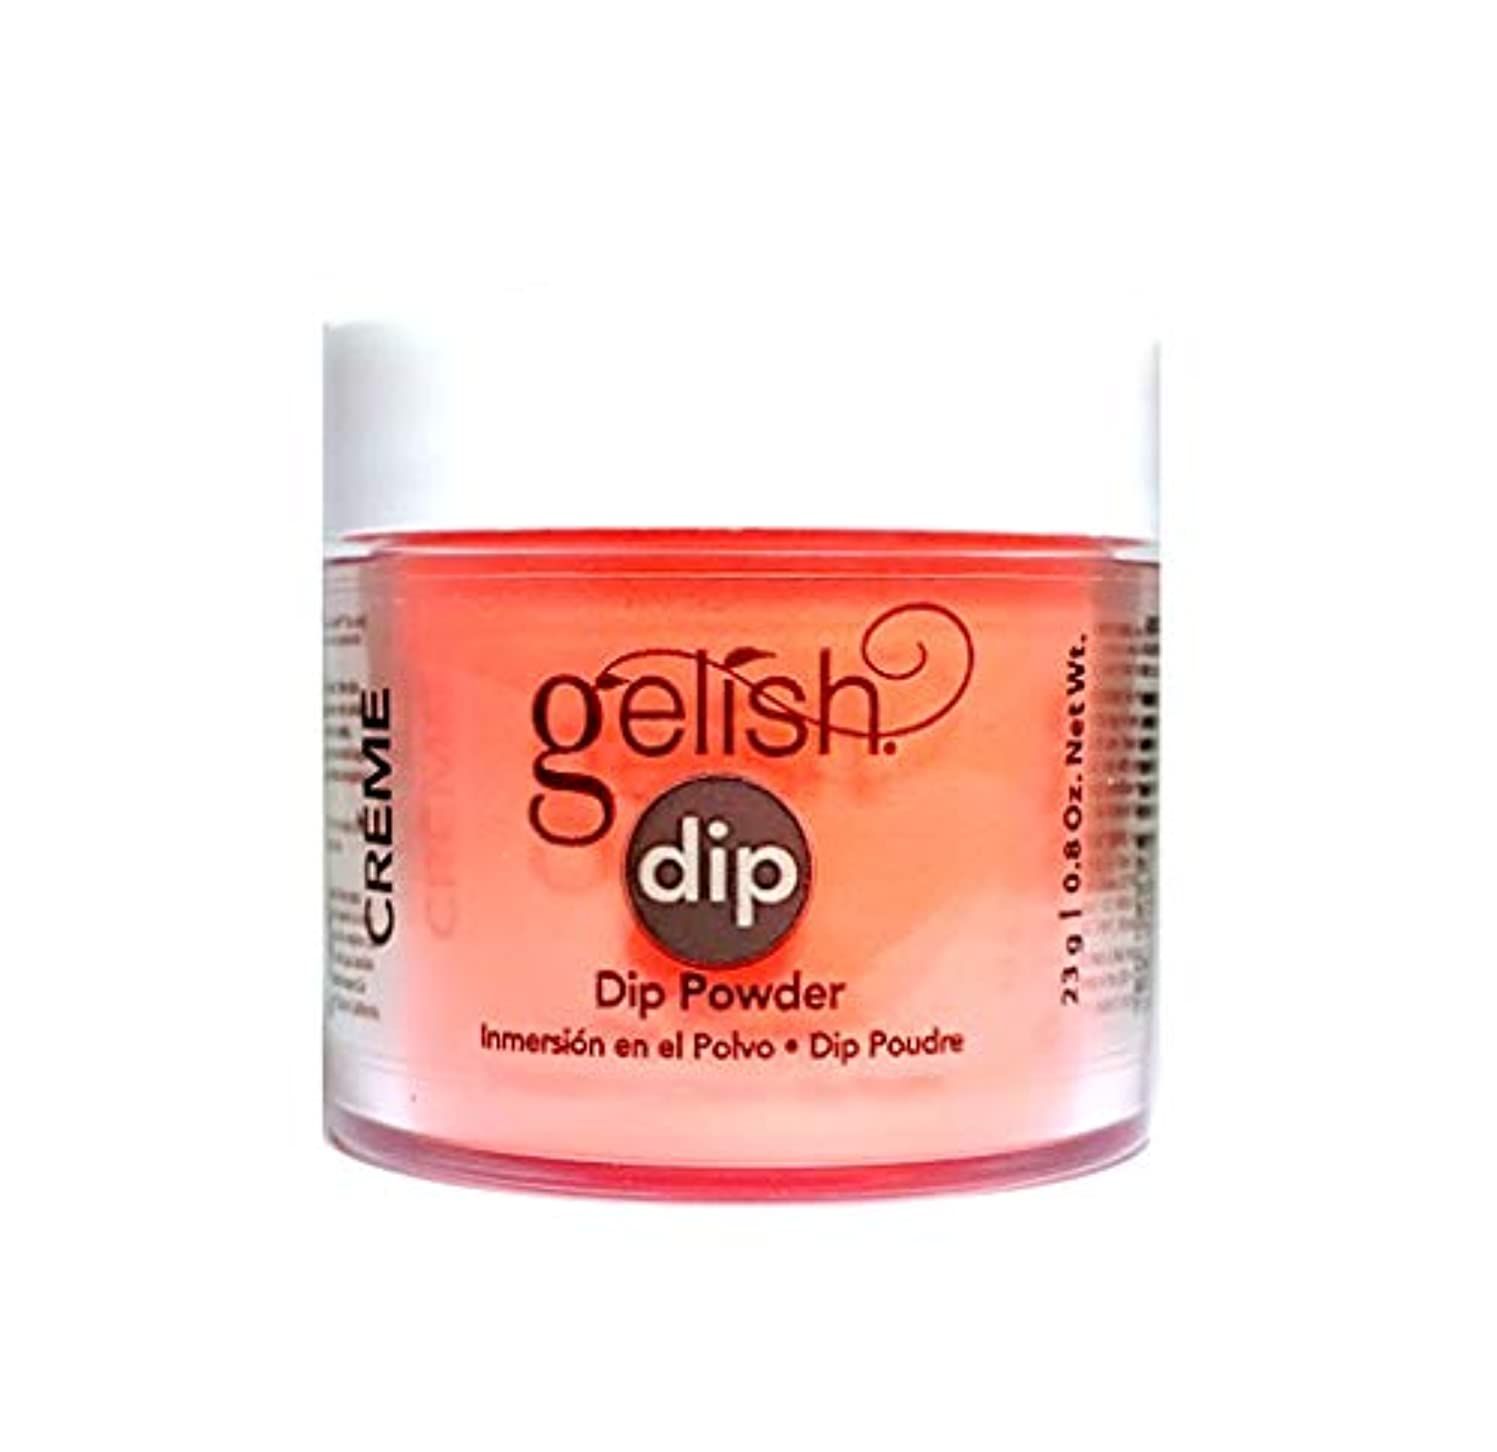 宇宙飛行士連続した微生物Harmony Gelish - Dip Powder - Tiki Tiki Laranga - 23g / 0.8oz